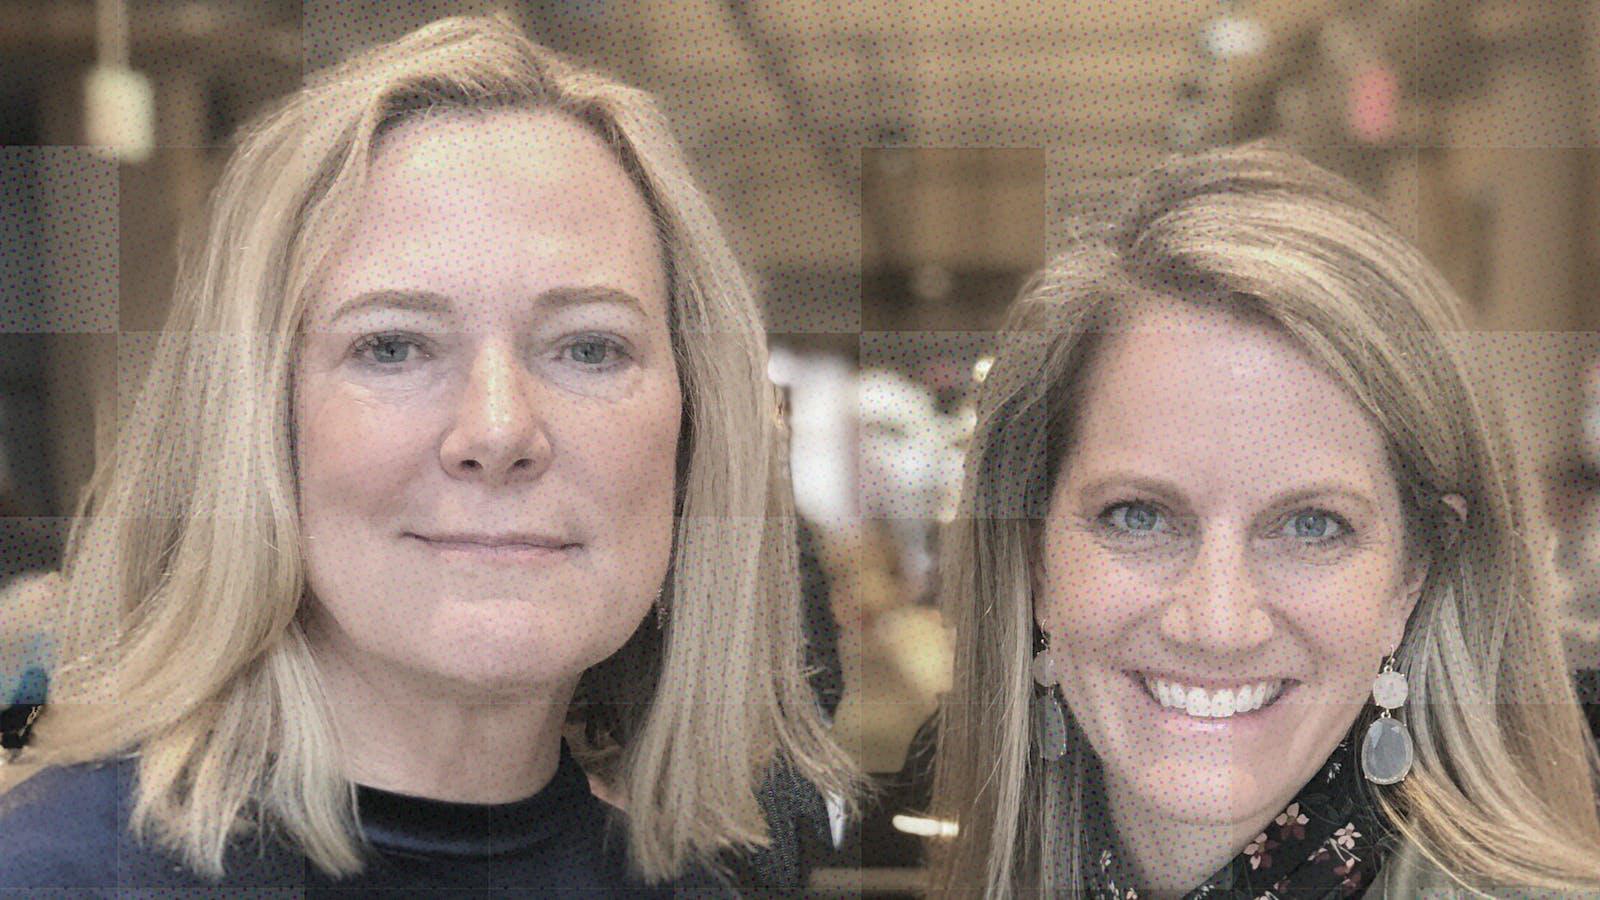 Deborah Jackson (l.) and Andrea Turner Moffitt, co-founders of Plum Alley Investments. Photo: Samantha Casolari